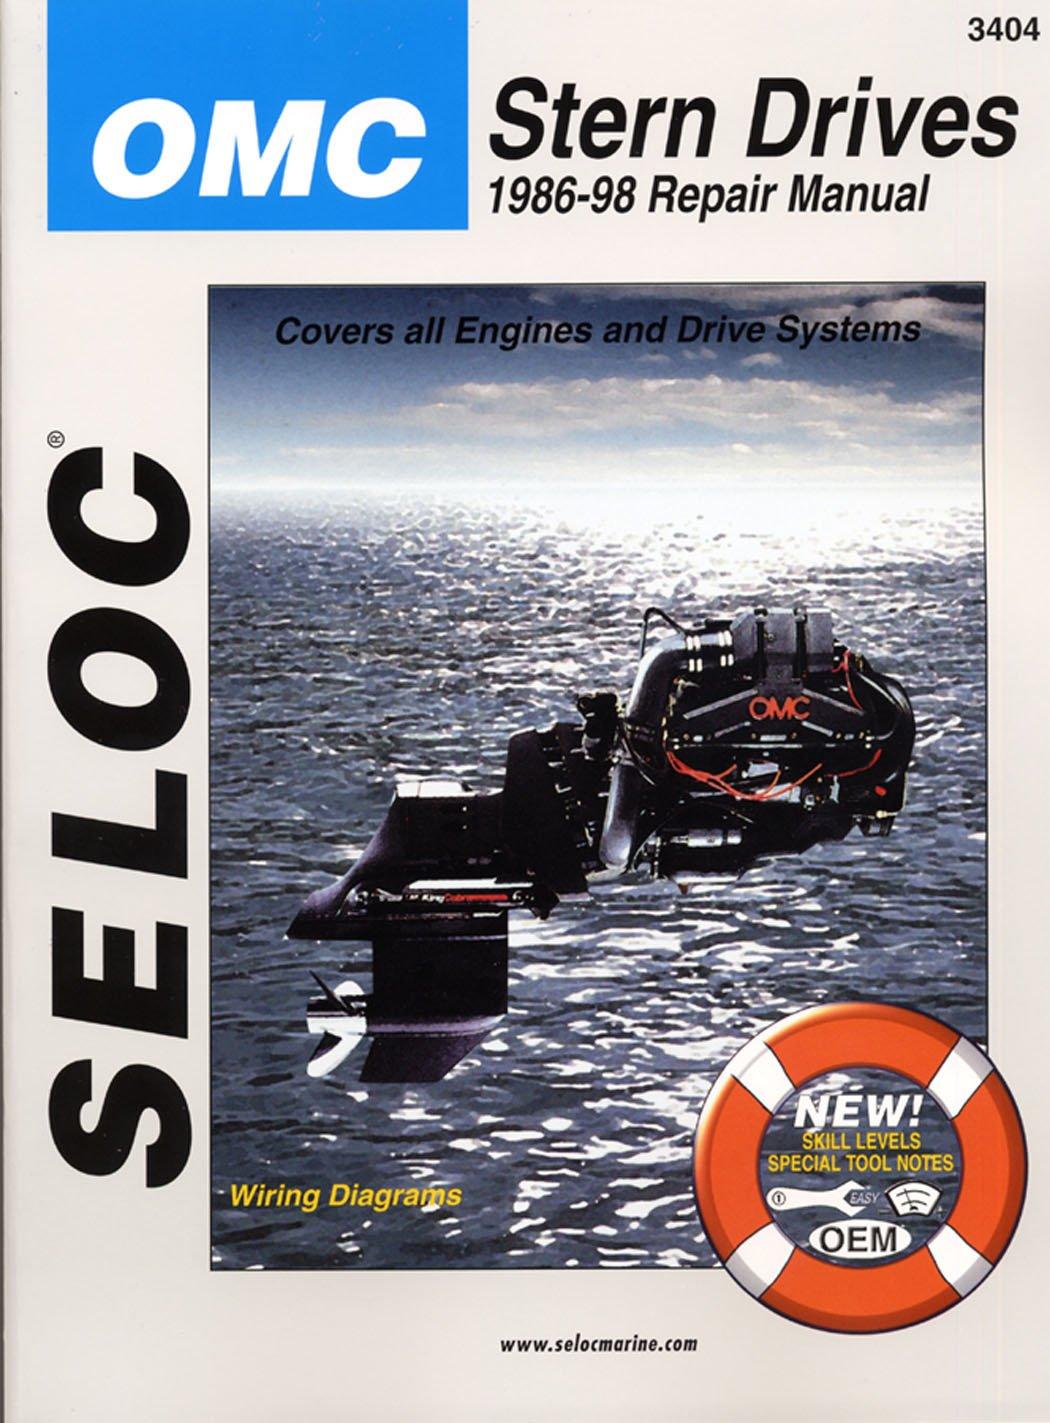 Amazon.com : Sierra International Seloc Manual 18-03404 Omc Cobra Stern  Drives Repair 1986-1998 Engine & Drive Systems : Sports & Outdoors